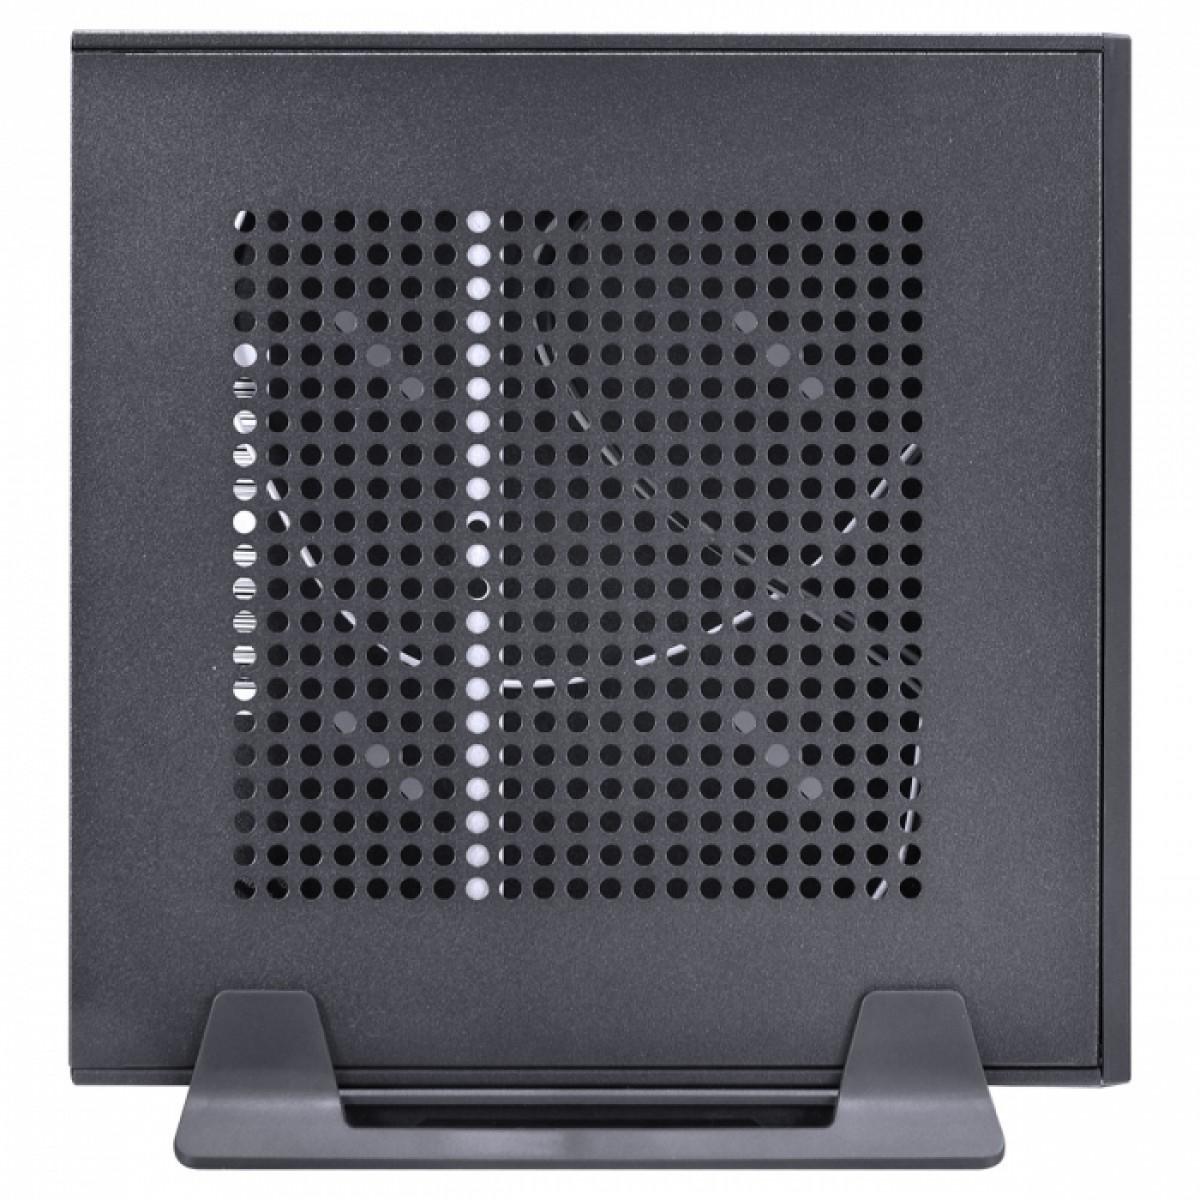 Computador Skul T-Home Business B300 i3 9100 / 8GB DDR4 SODIMM / SSD 240GB / HDMI/DP / FONTE EXTERNA 90W